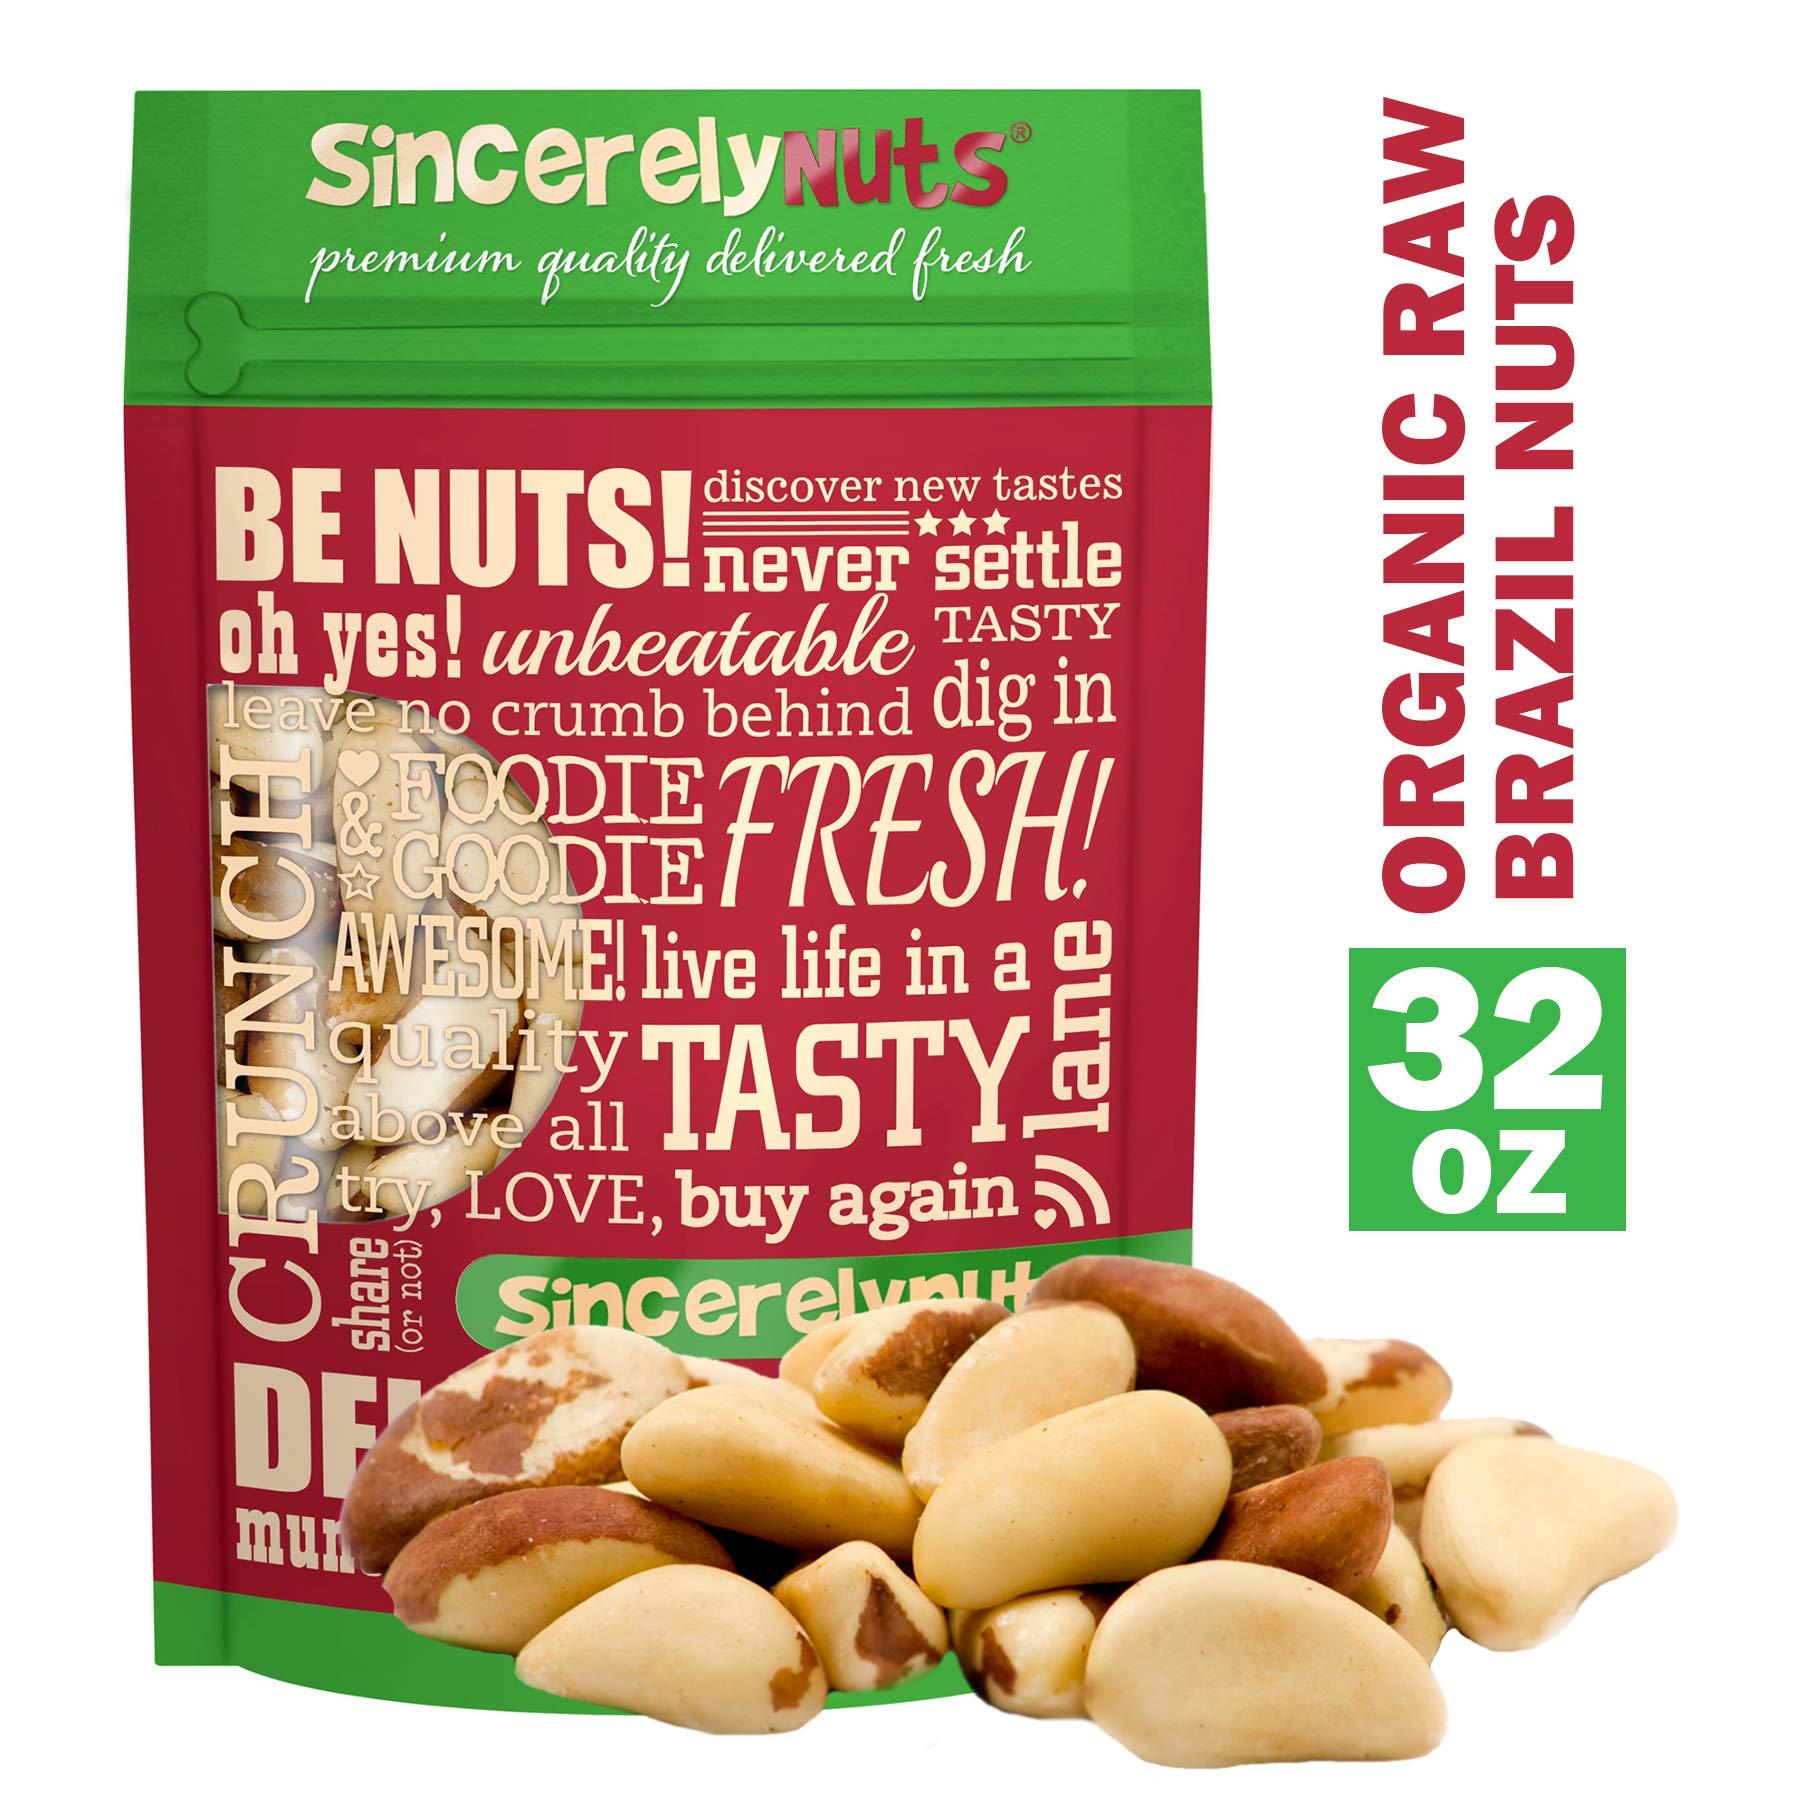 Sincerely Nuts Organic Raw Brazil Nuts No Shell (2 Lb. Bag) -Premium Healthy Snack Food | Whole, Kosher, Vegan, Gluten Free | Keto & Paleo Diet Friendly |Gourmet Snack | Vitamins & Minerals